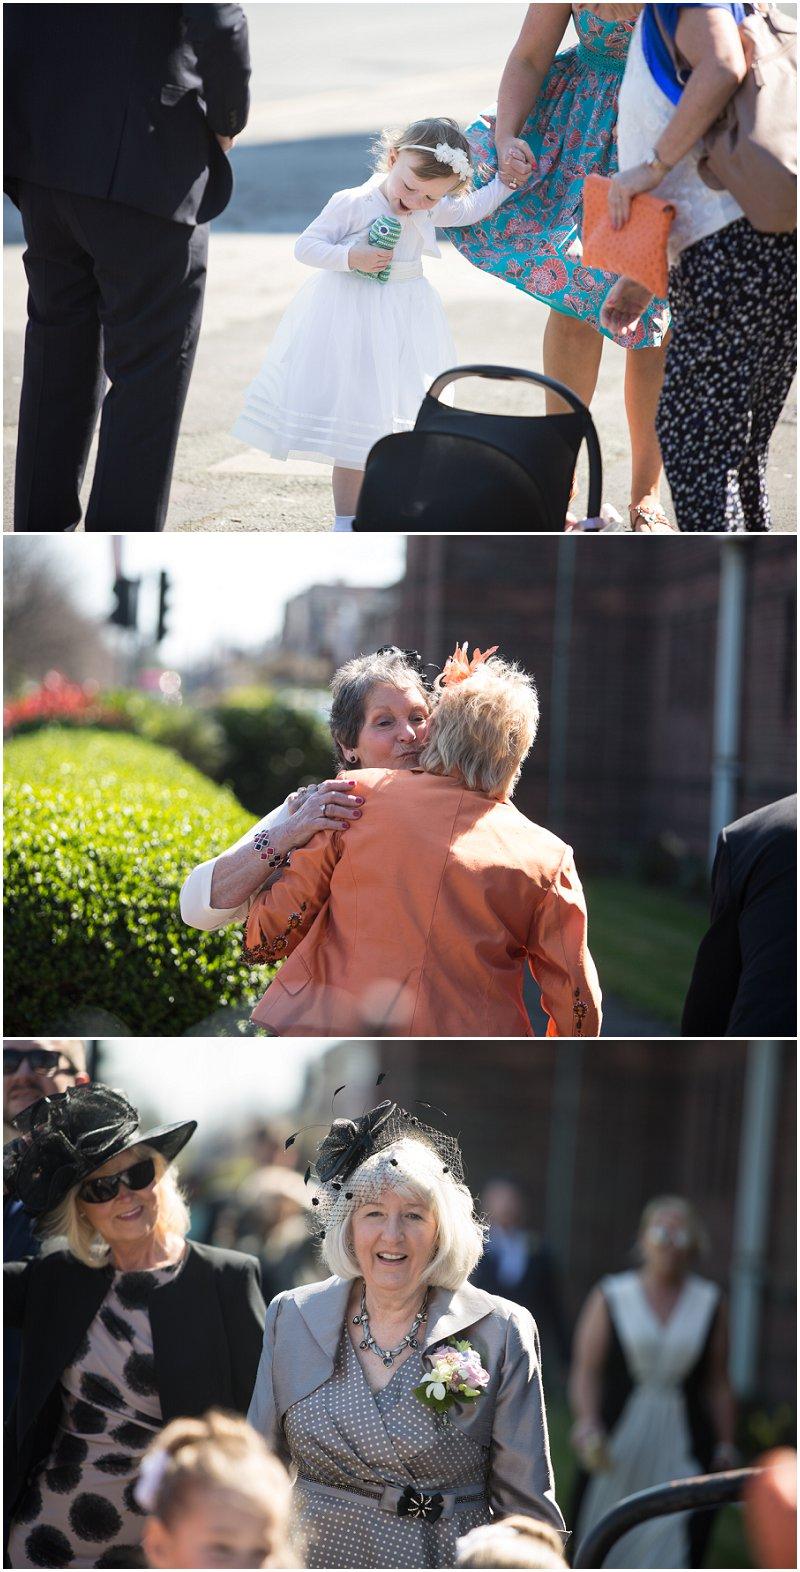 Wedding guests enjoying the sunshine at Liverpool Wedding